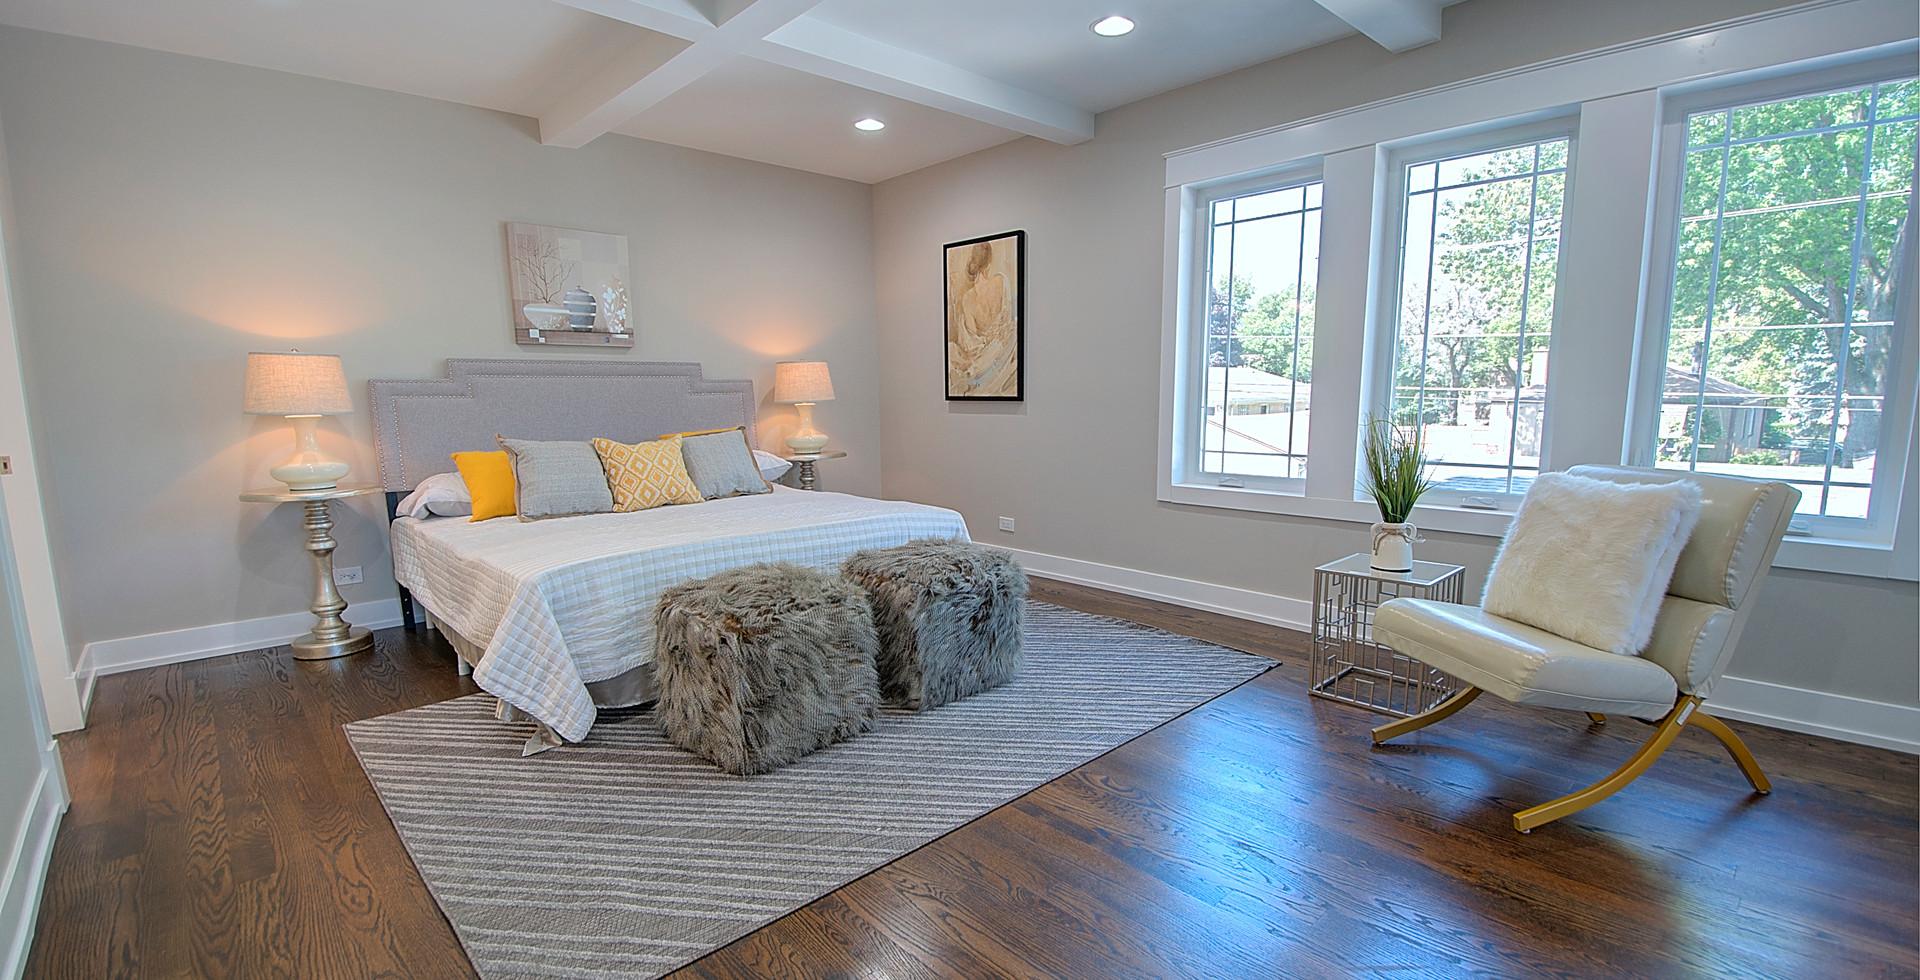 Bedroom in Lombard designed by MRM Home Design.jpg